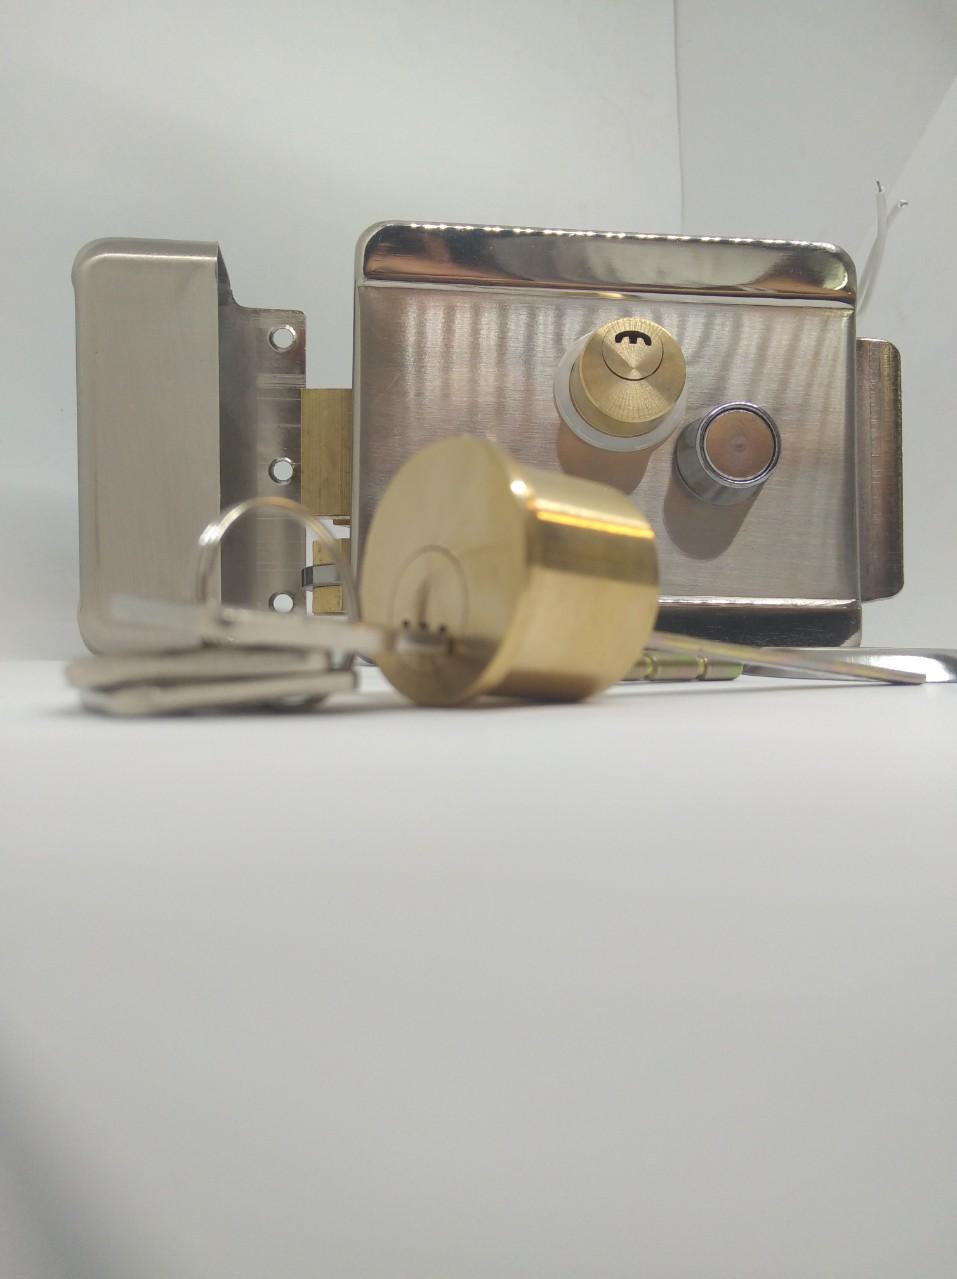 Laid on electromechanical lock FASS LOCK 2369-SSLaid on electromechanical lock FASS LOCK 2369-SS